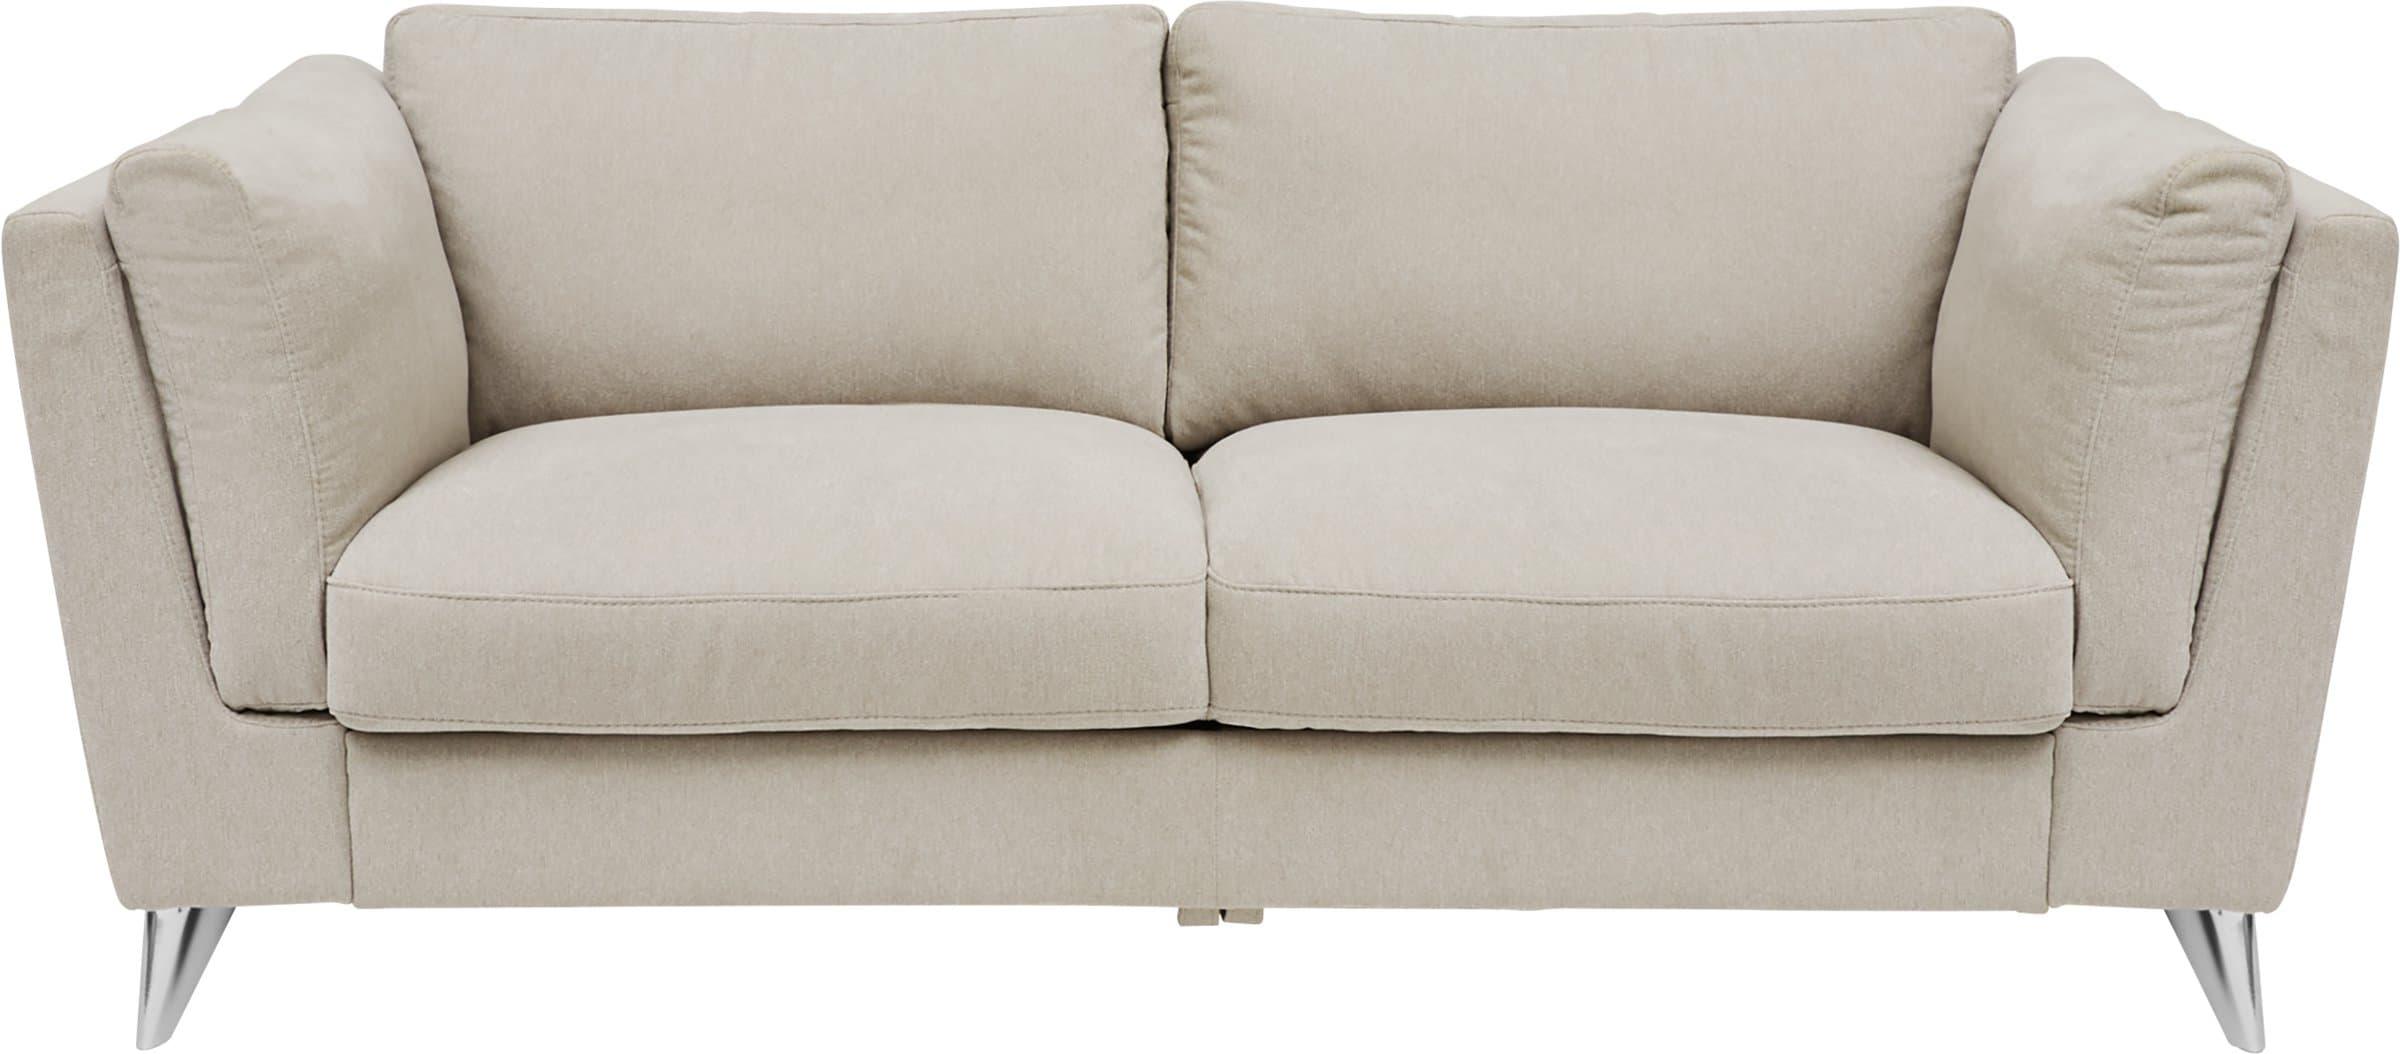 degonda 2er sofa migros. Black Bedroom Furniture Sets. Home Design Ideas